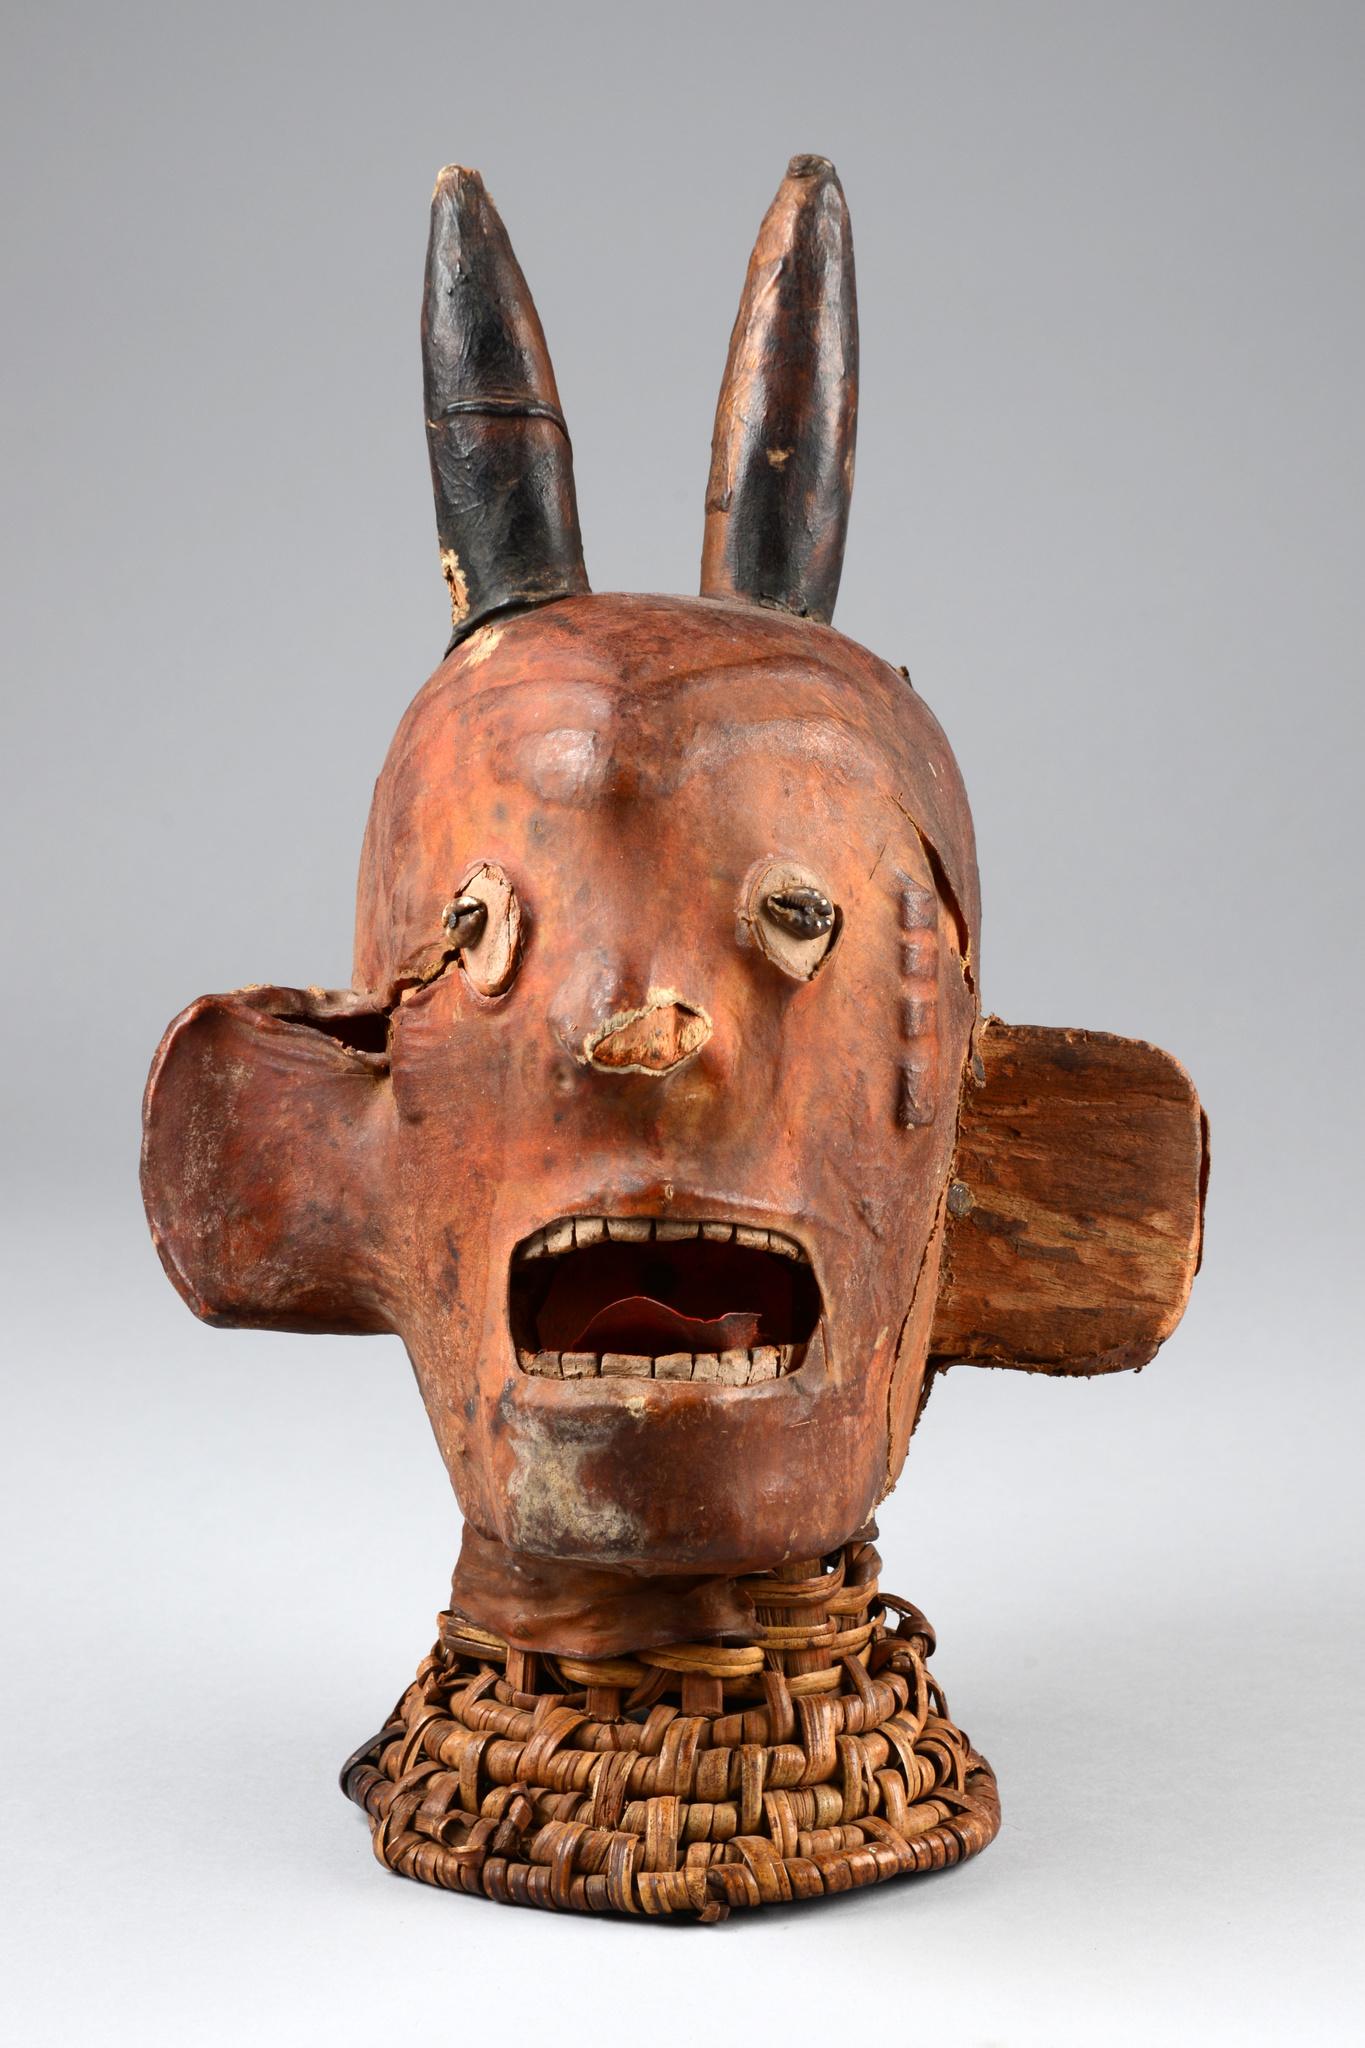 Anthropomorphic headdress with horns